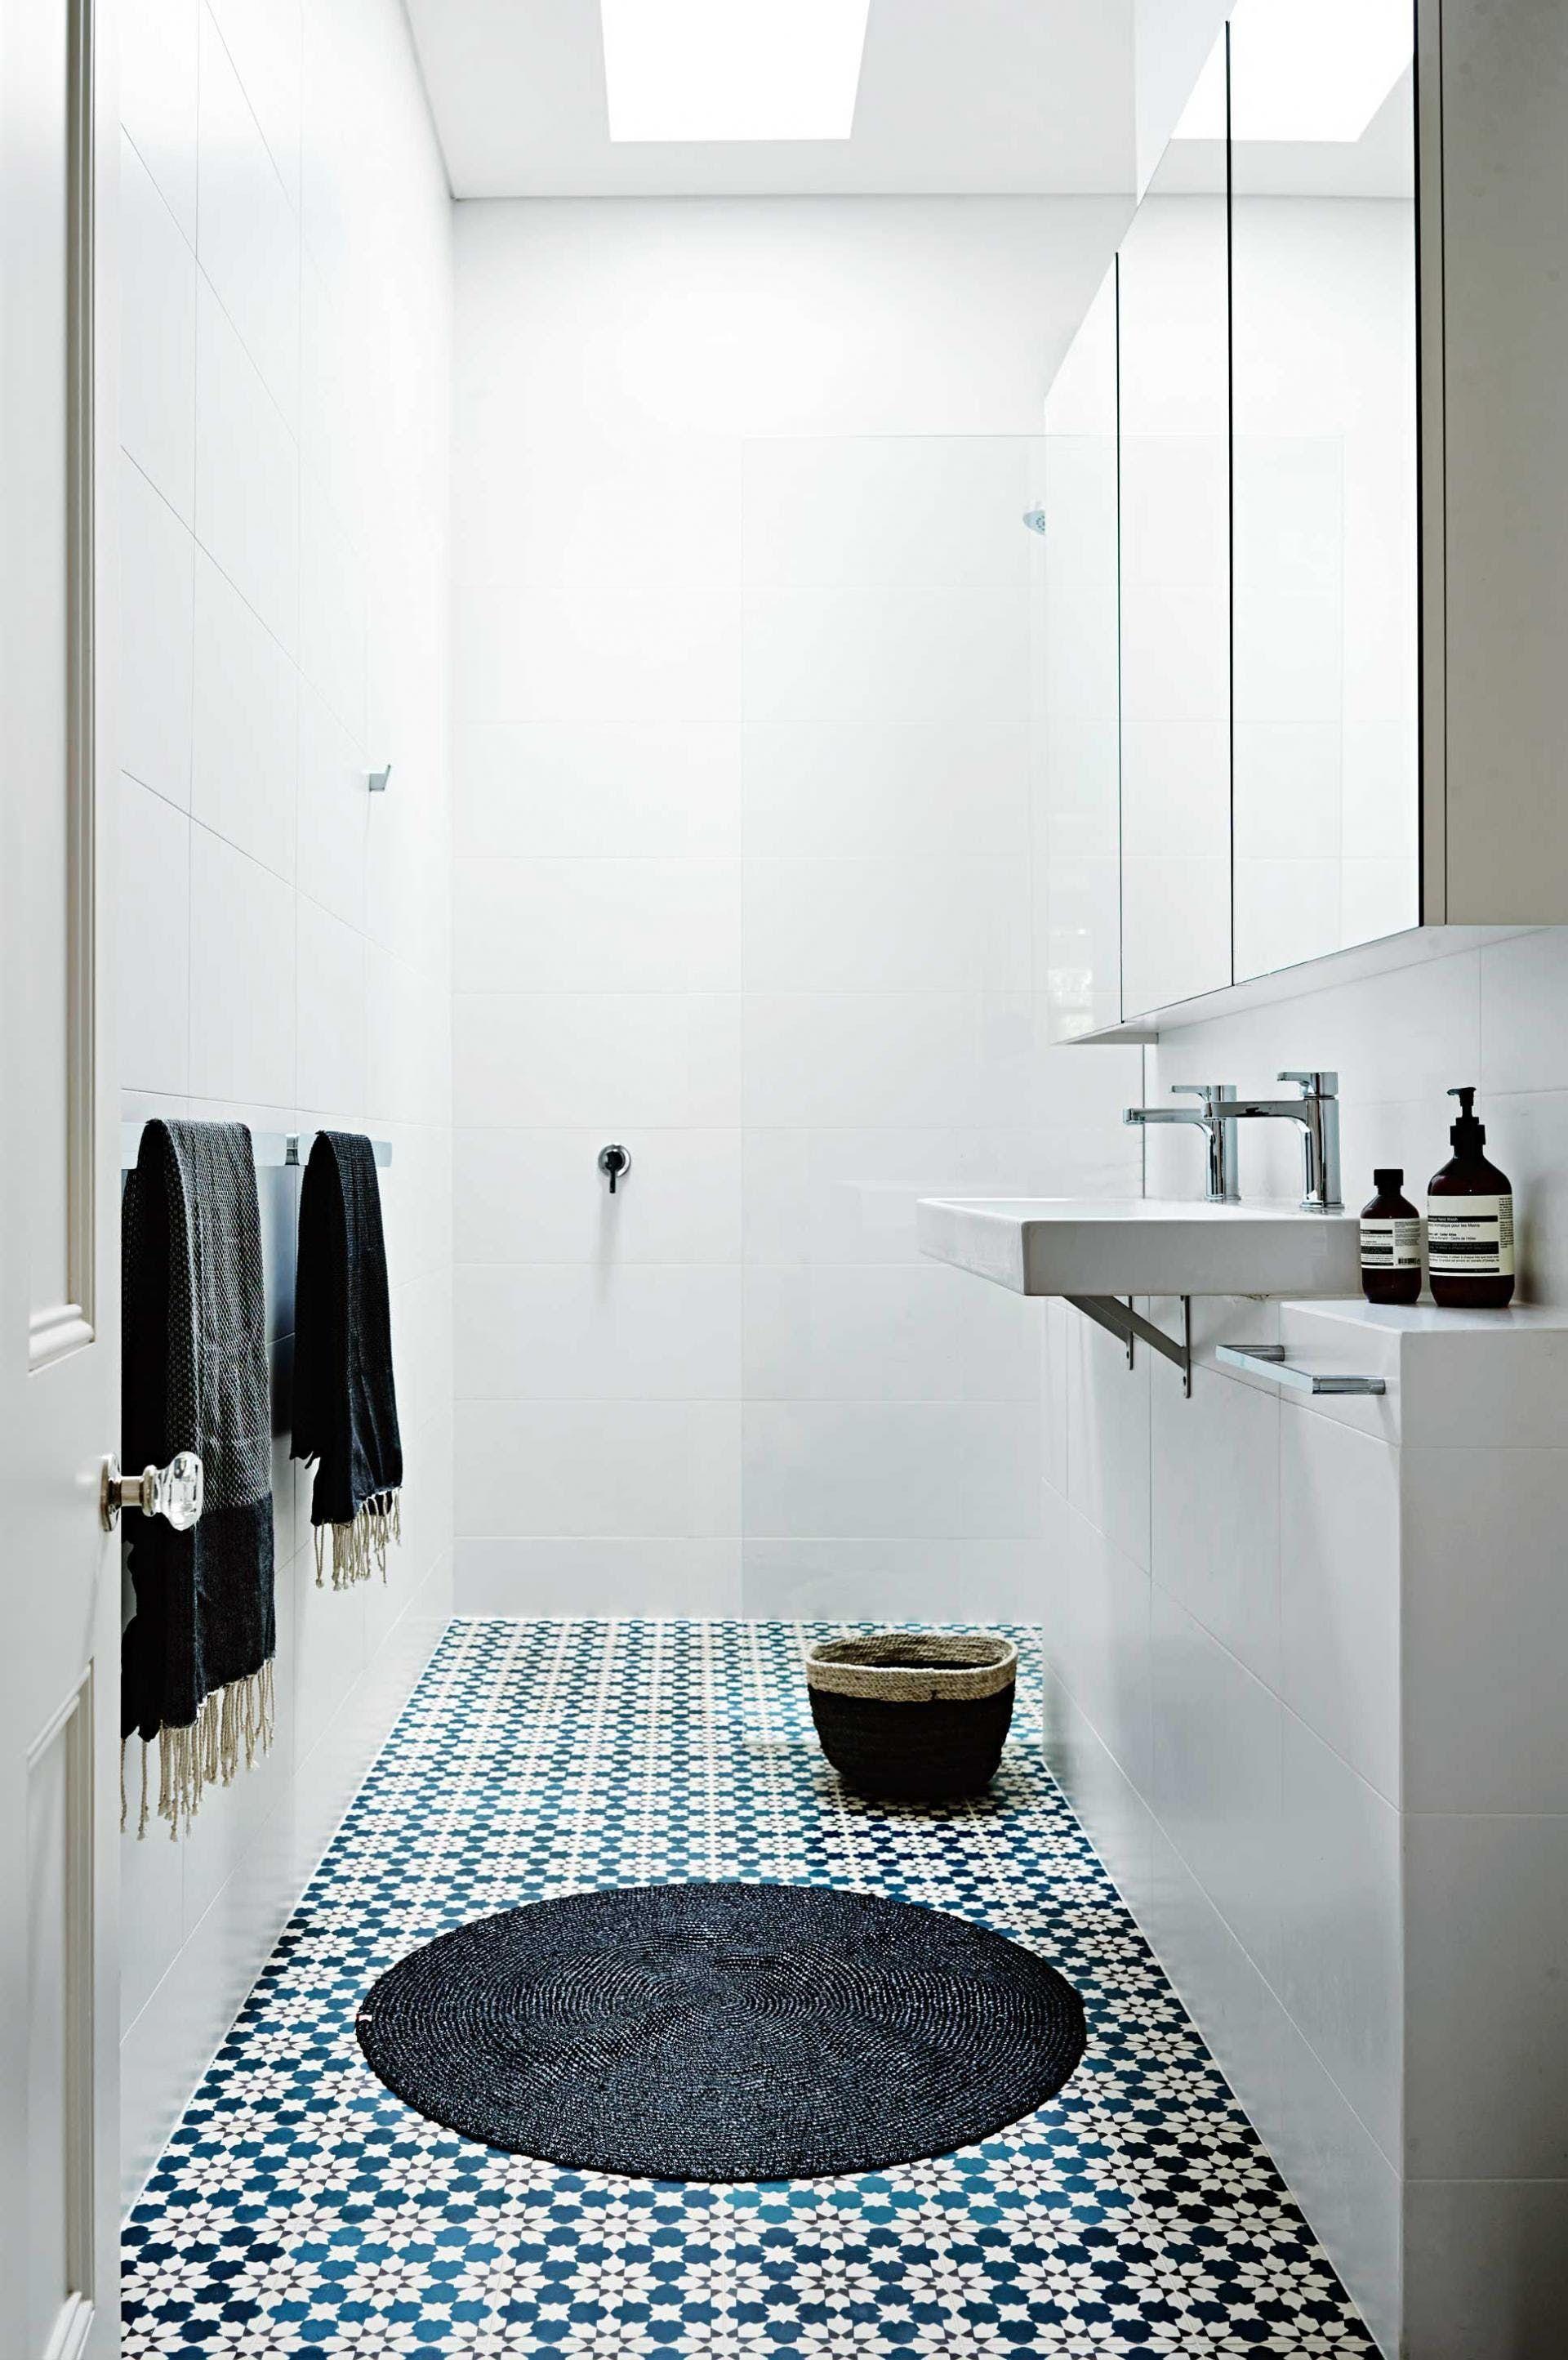 50 Gorgeous Bathroom Tile Ideas You Need to See | Bathroom ...